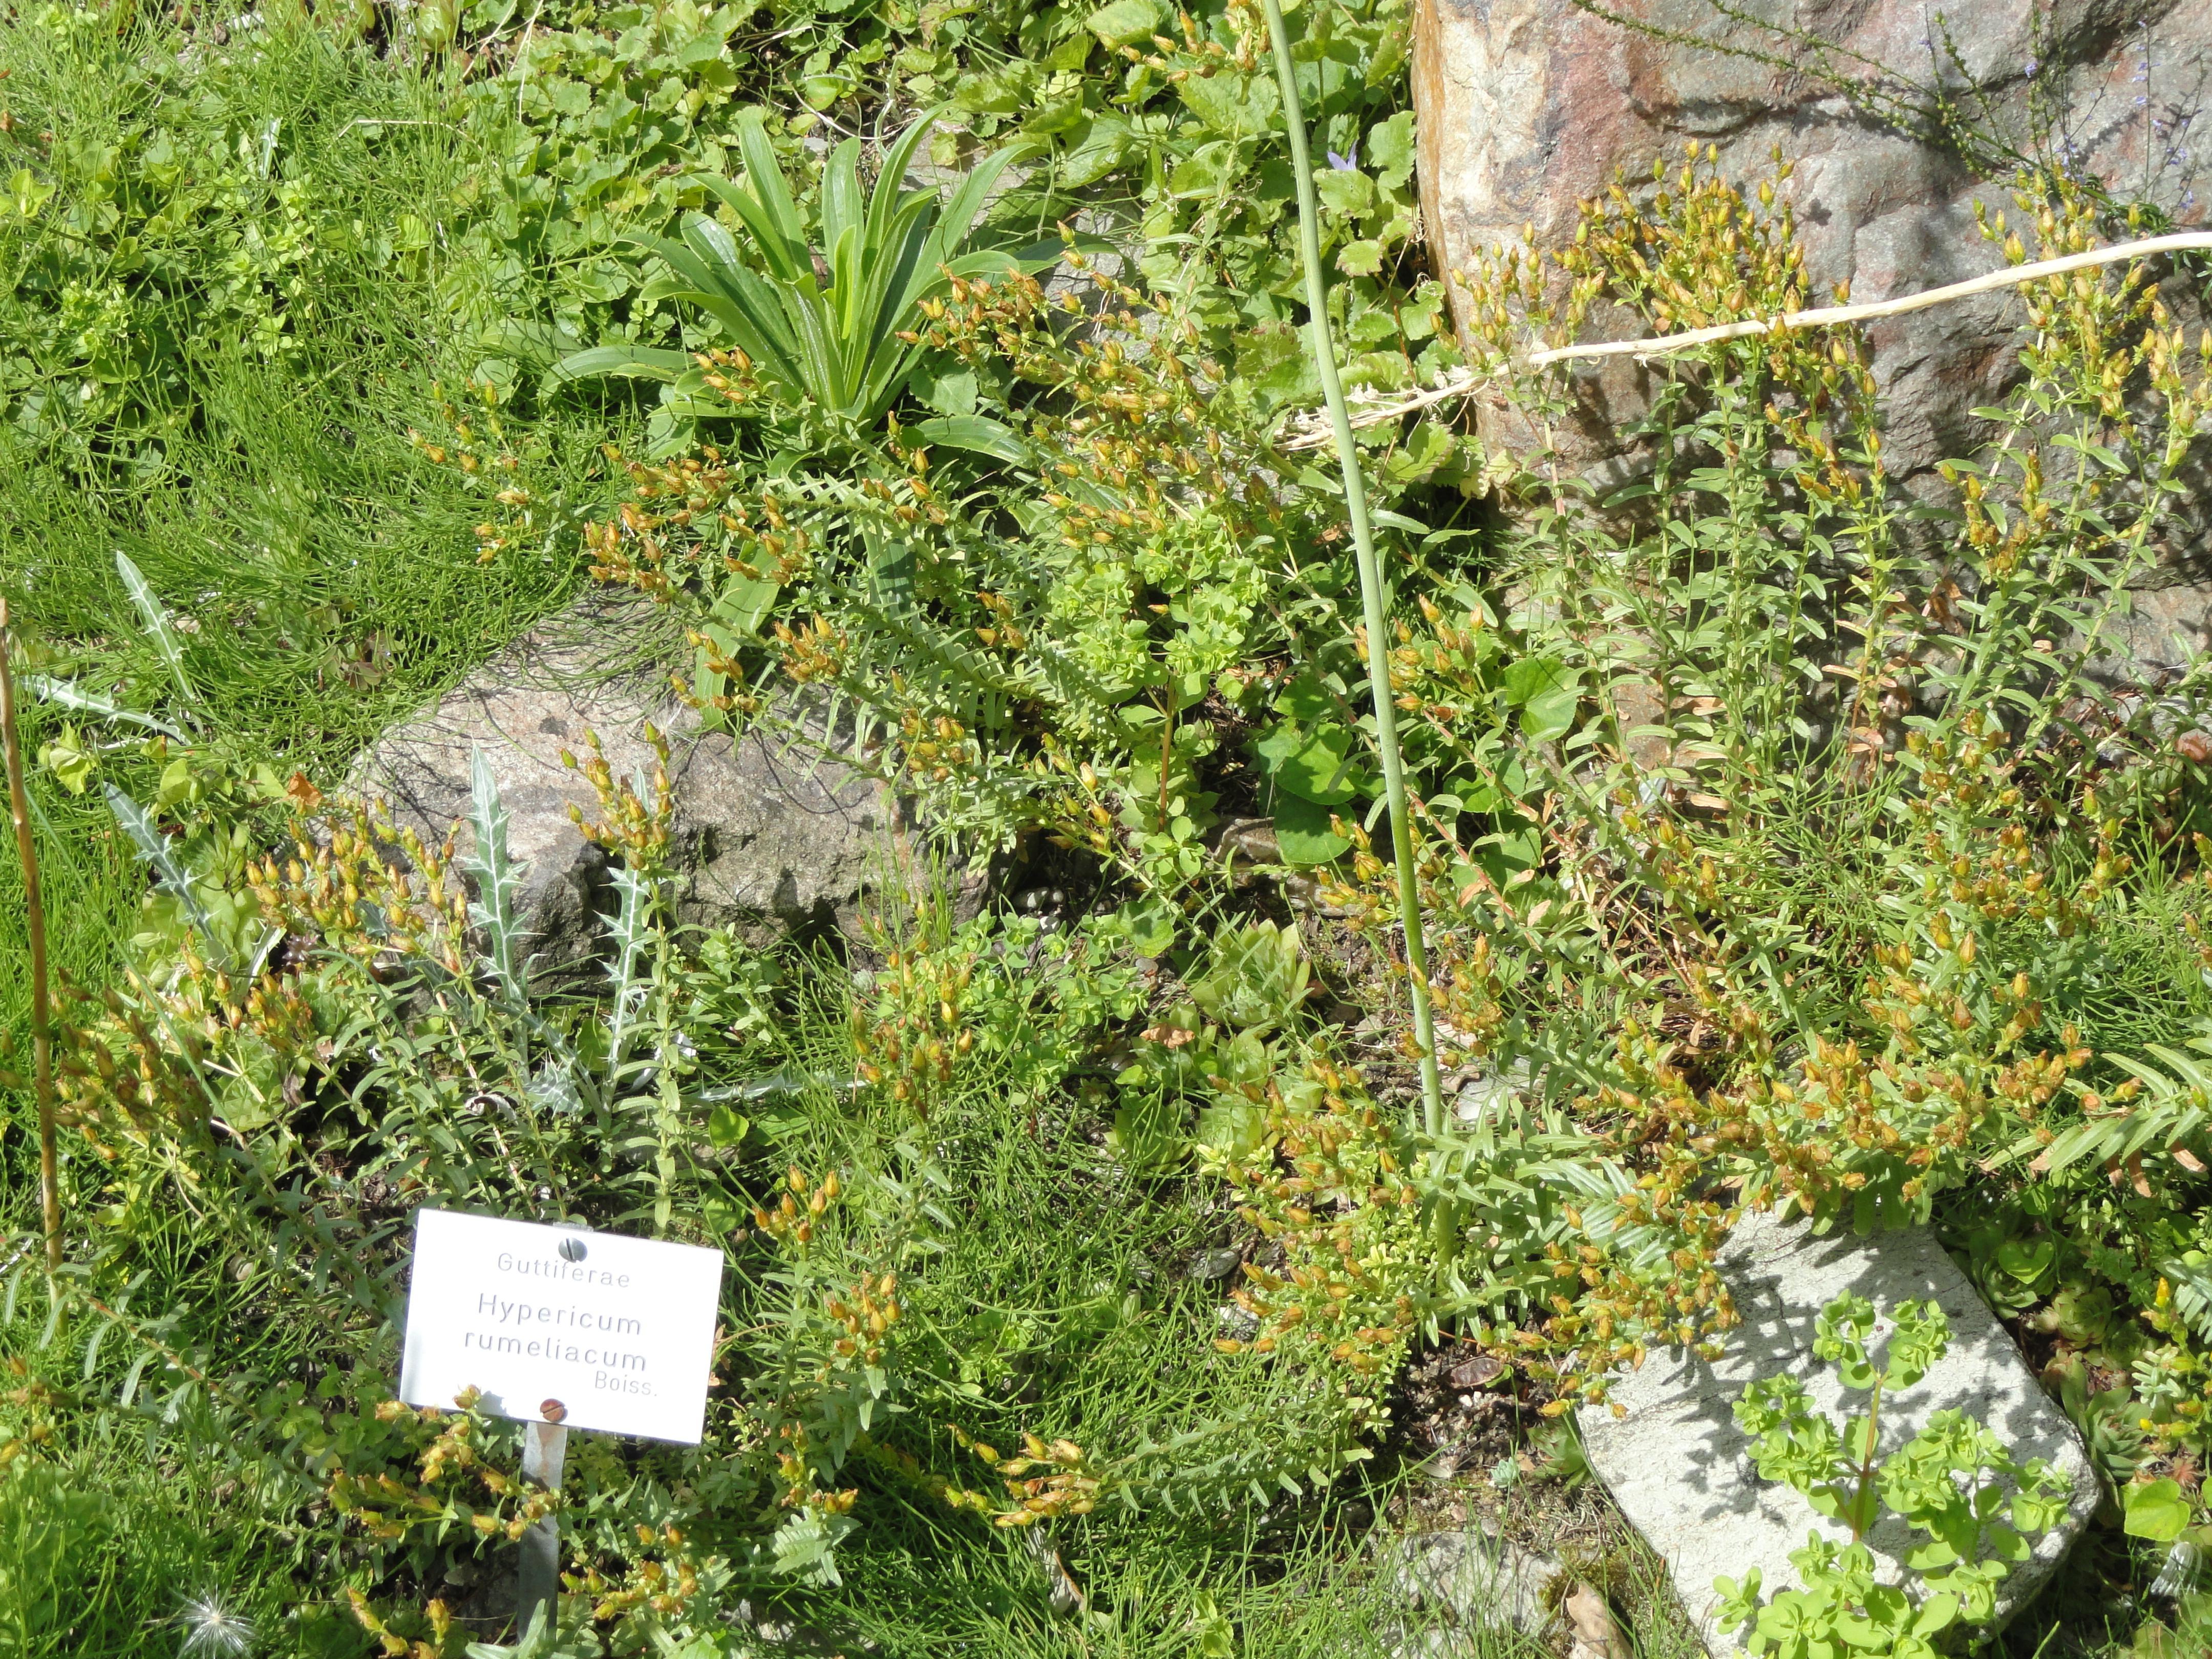 file hypericum rumeliacum botanischer garten frankfurt am main dsc02634 jpg wikipedia. Black Bedroom Furniture Sets. Home Design Ideas